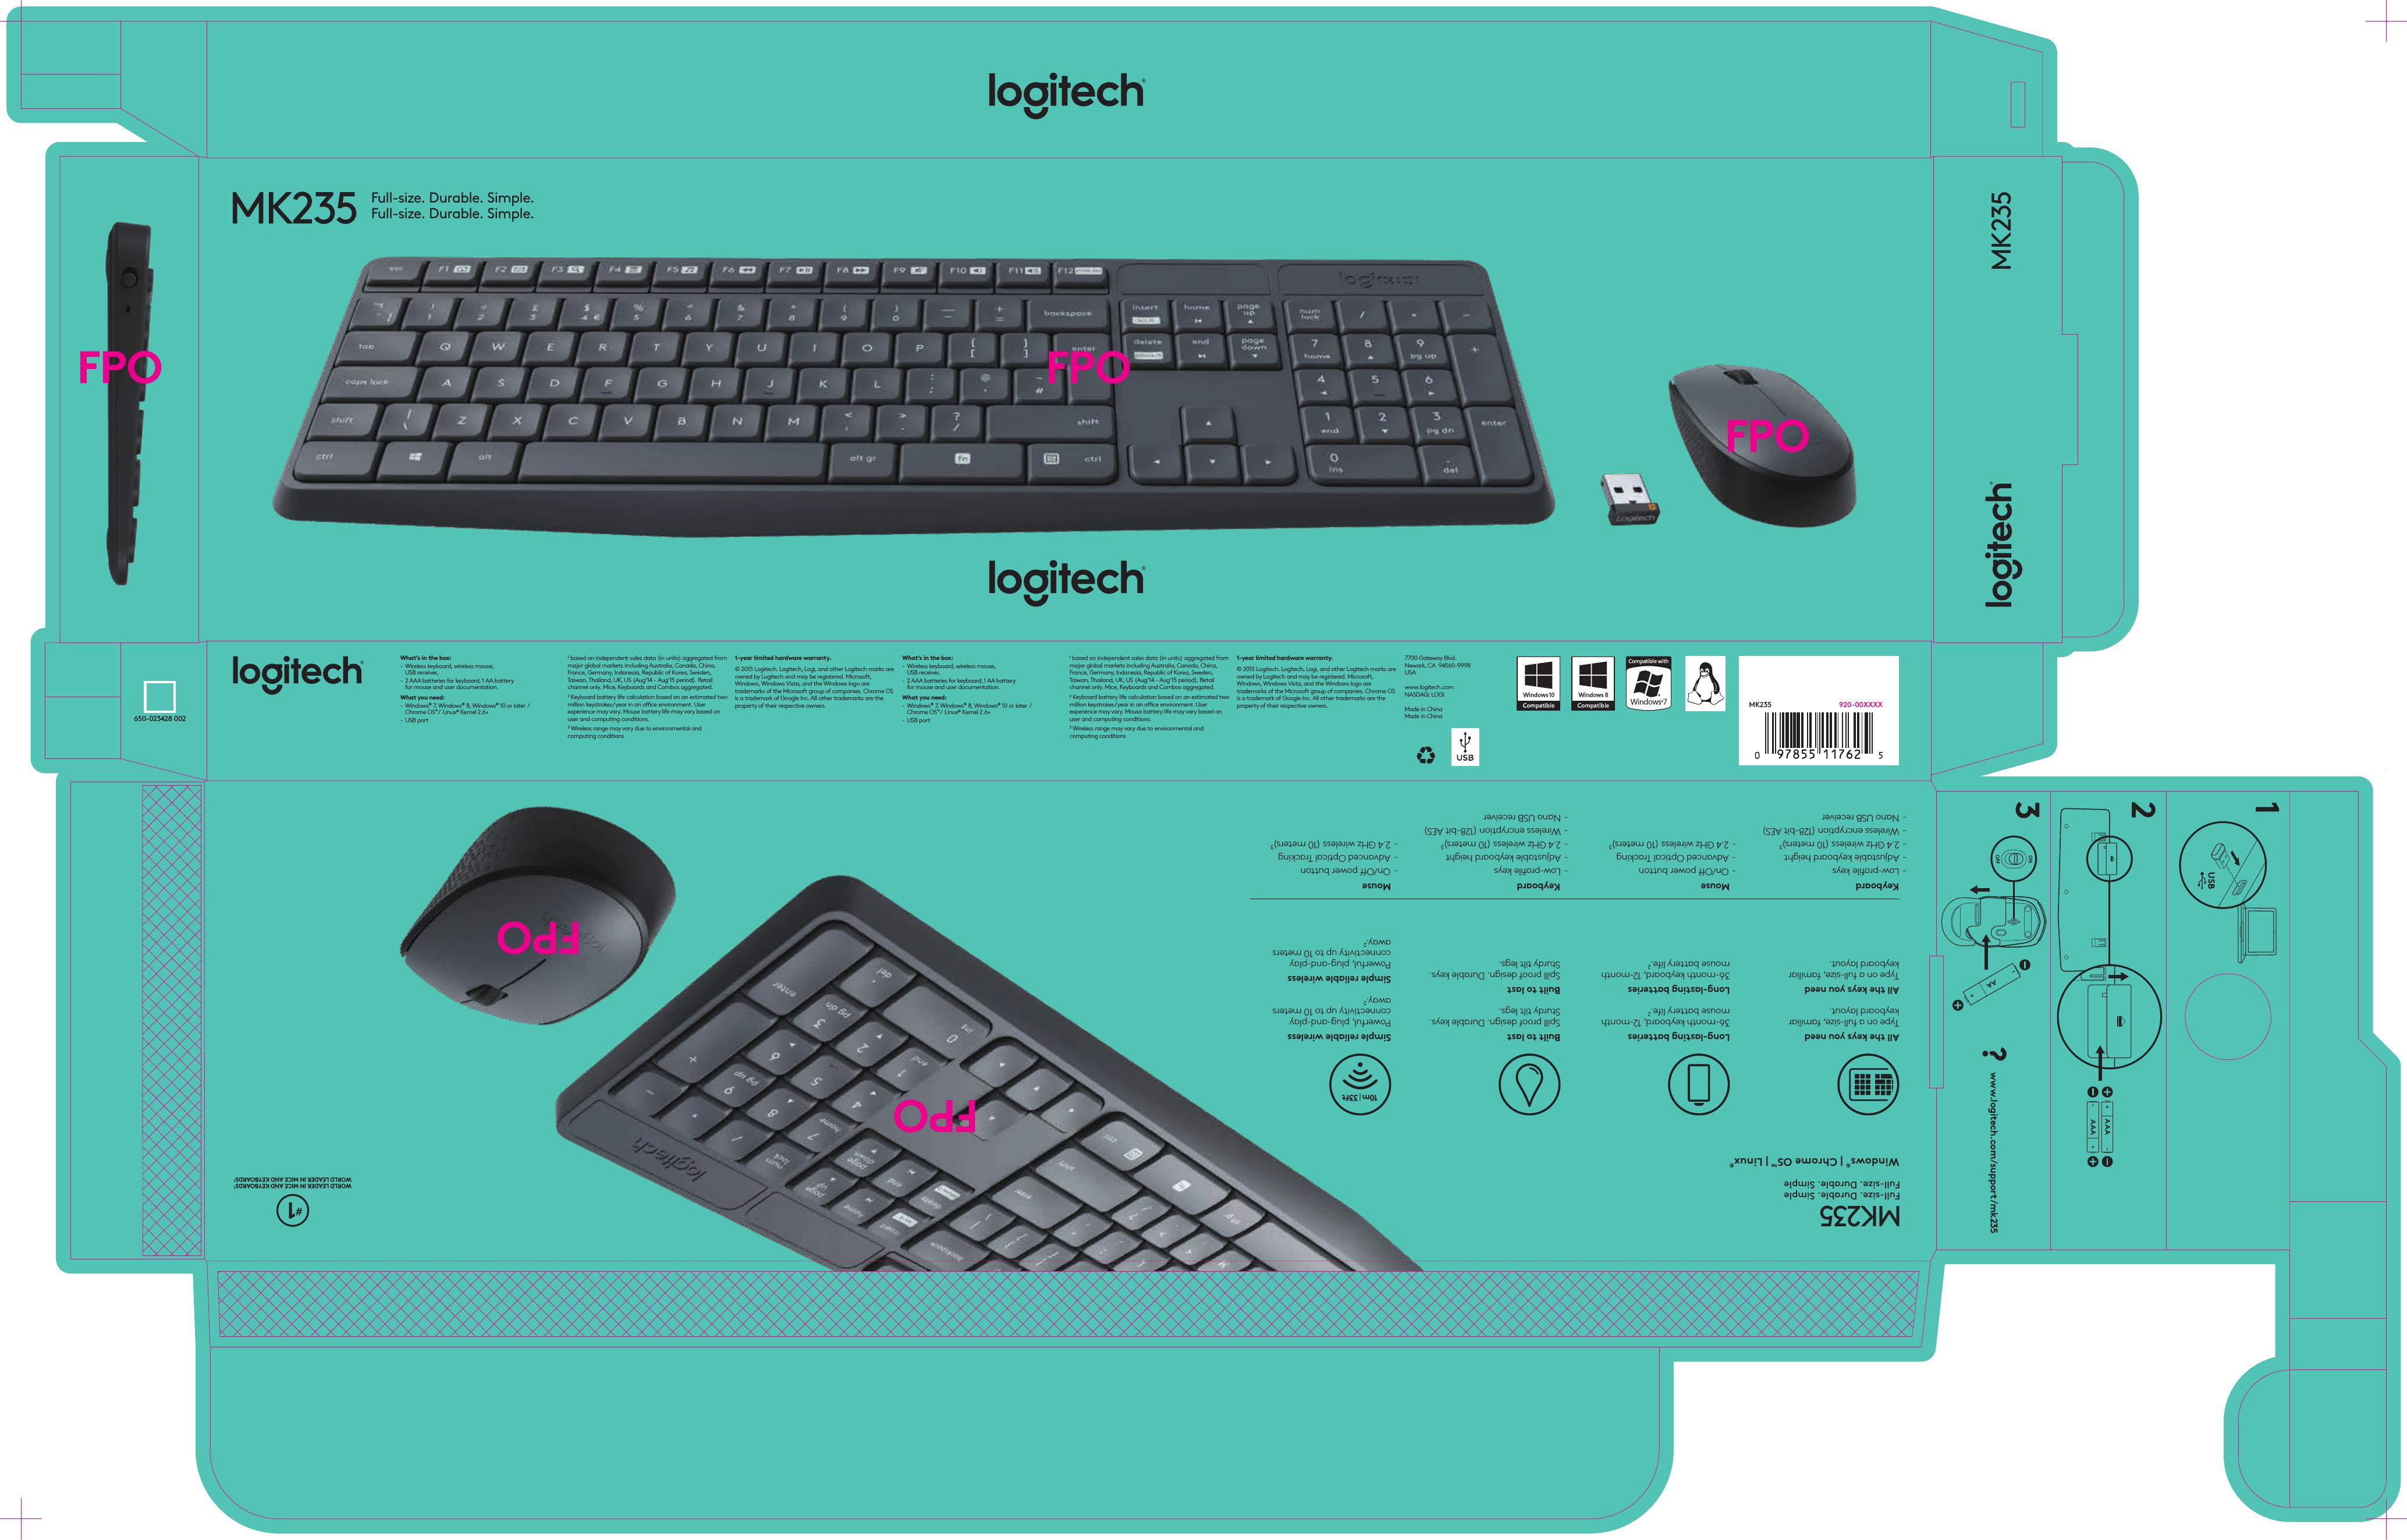 logitech far east yr0036 2 4ghz cordless keyboard user manual hanoi rh usermanual wiki Logitech Cordless Optical Trackman Mouse Logitech Cordless Optical Mouse Drivers